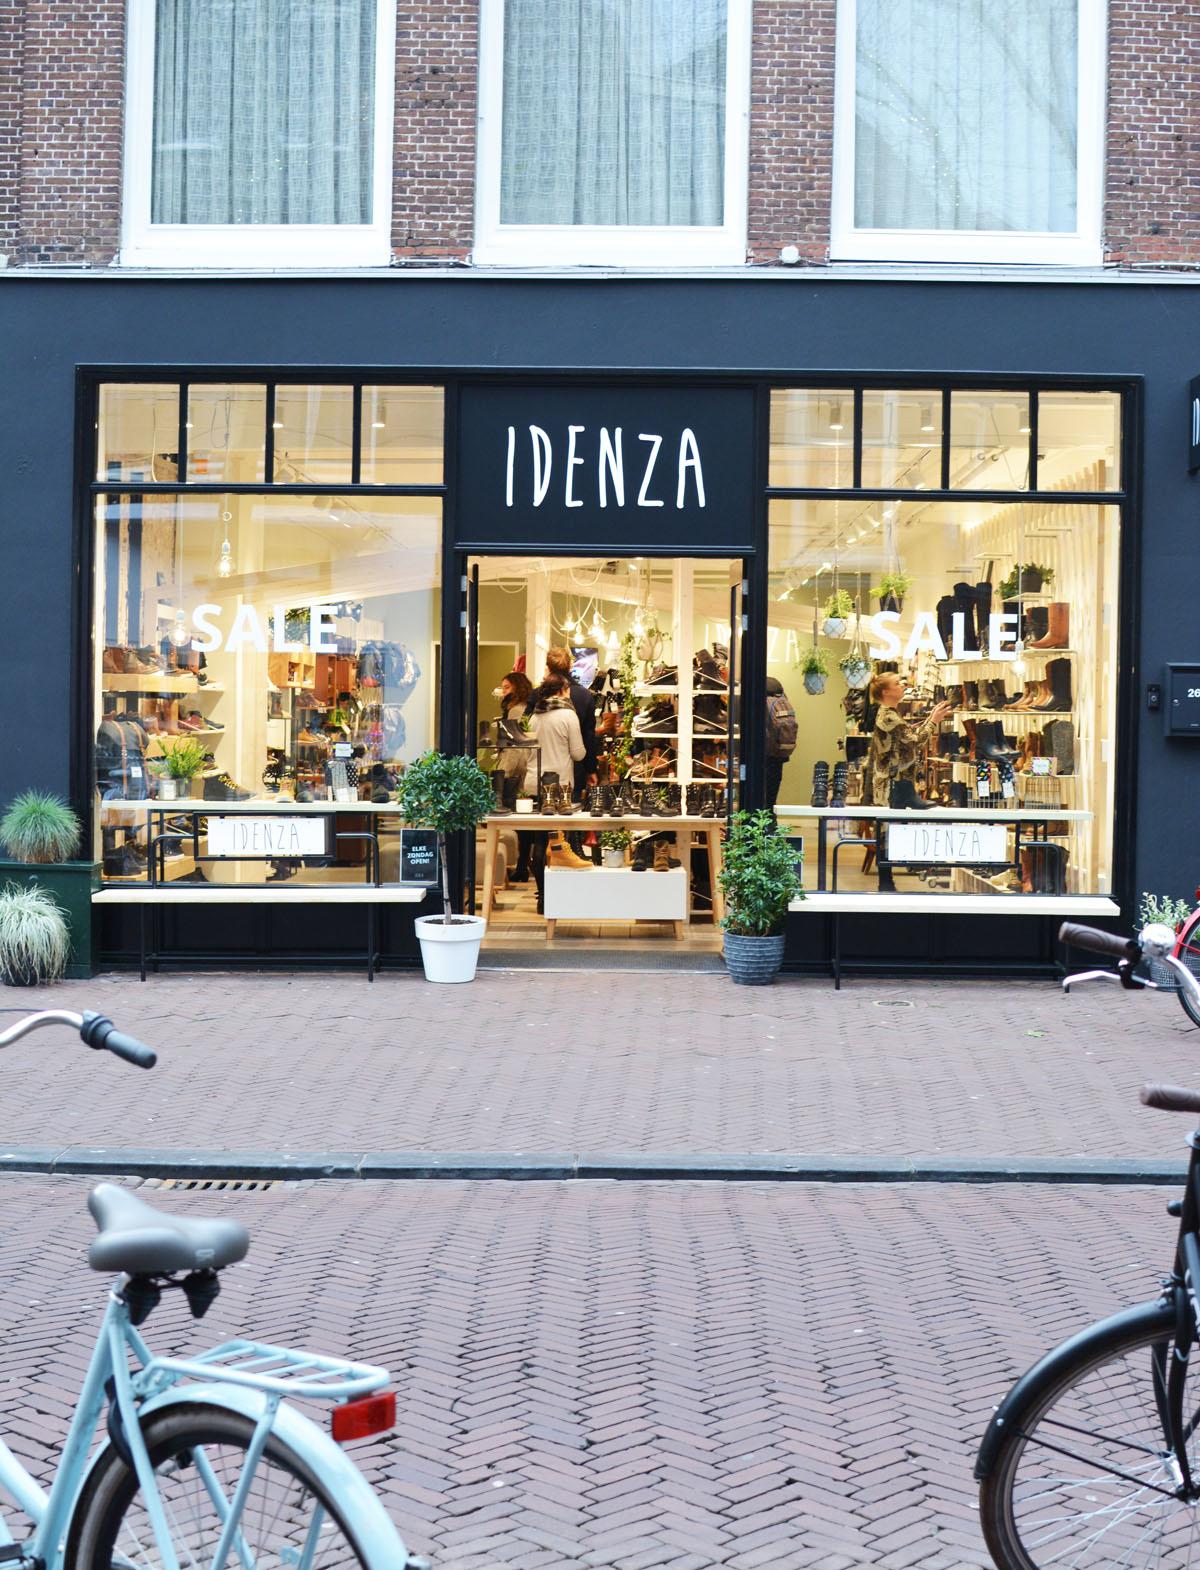 idenza-11